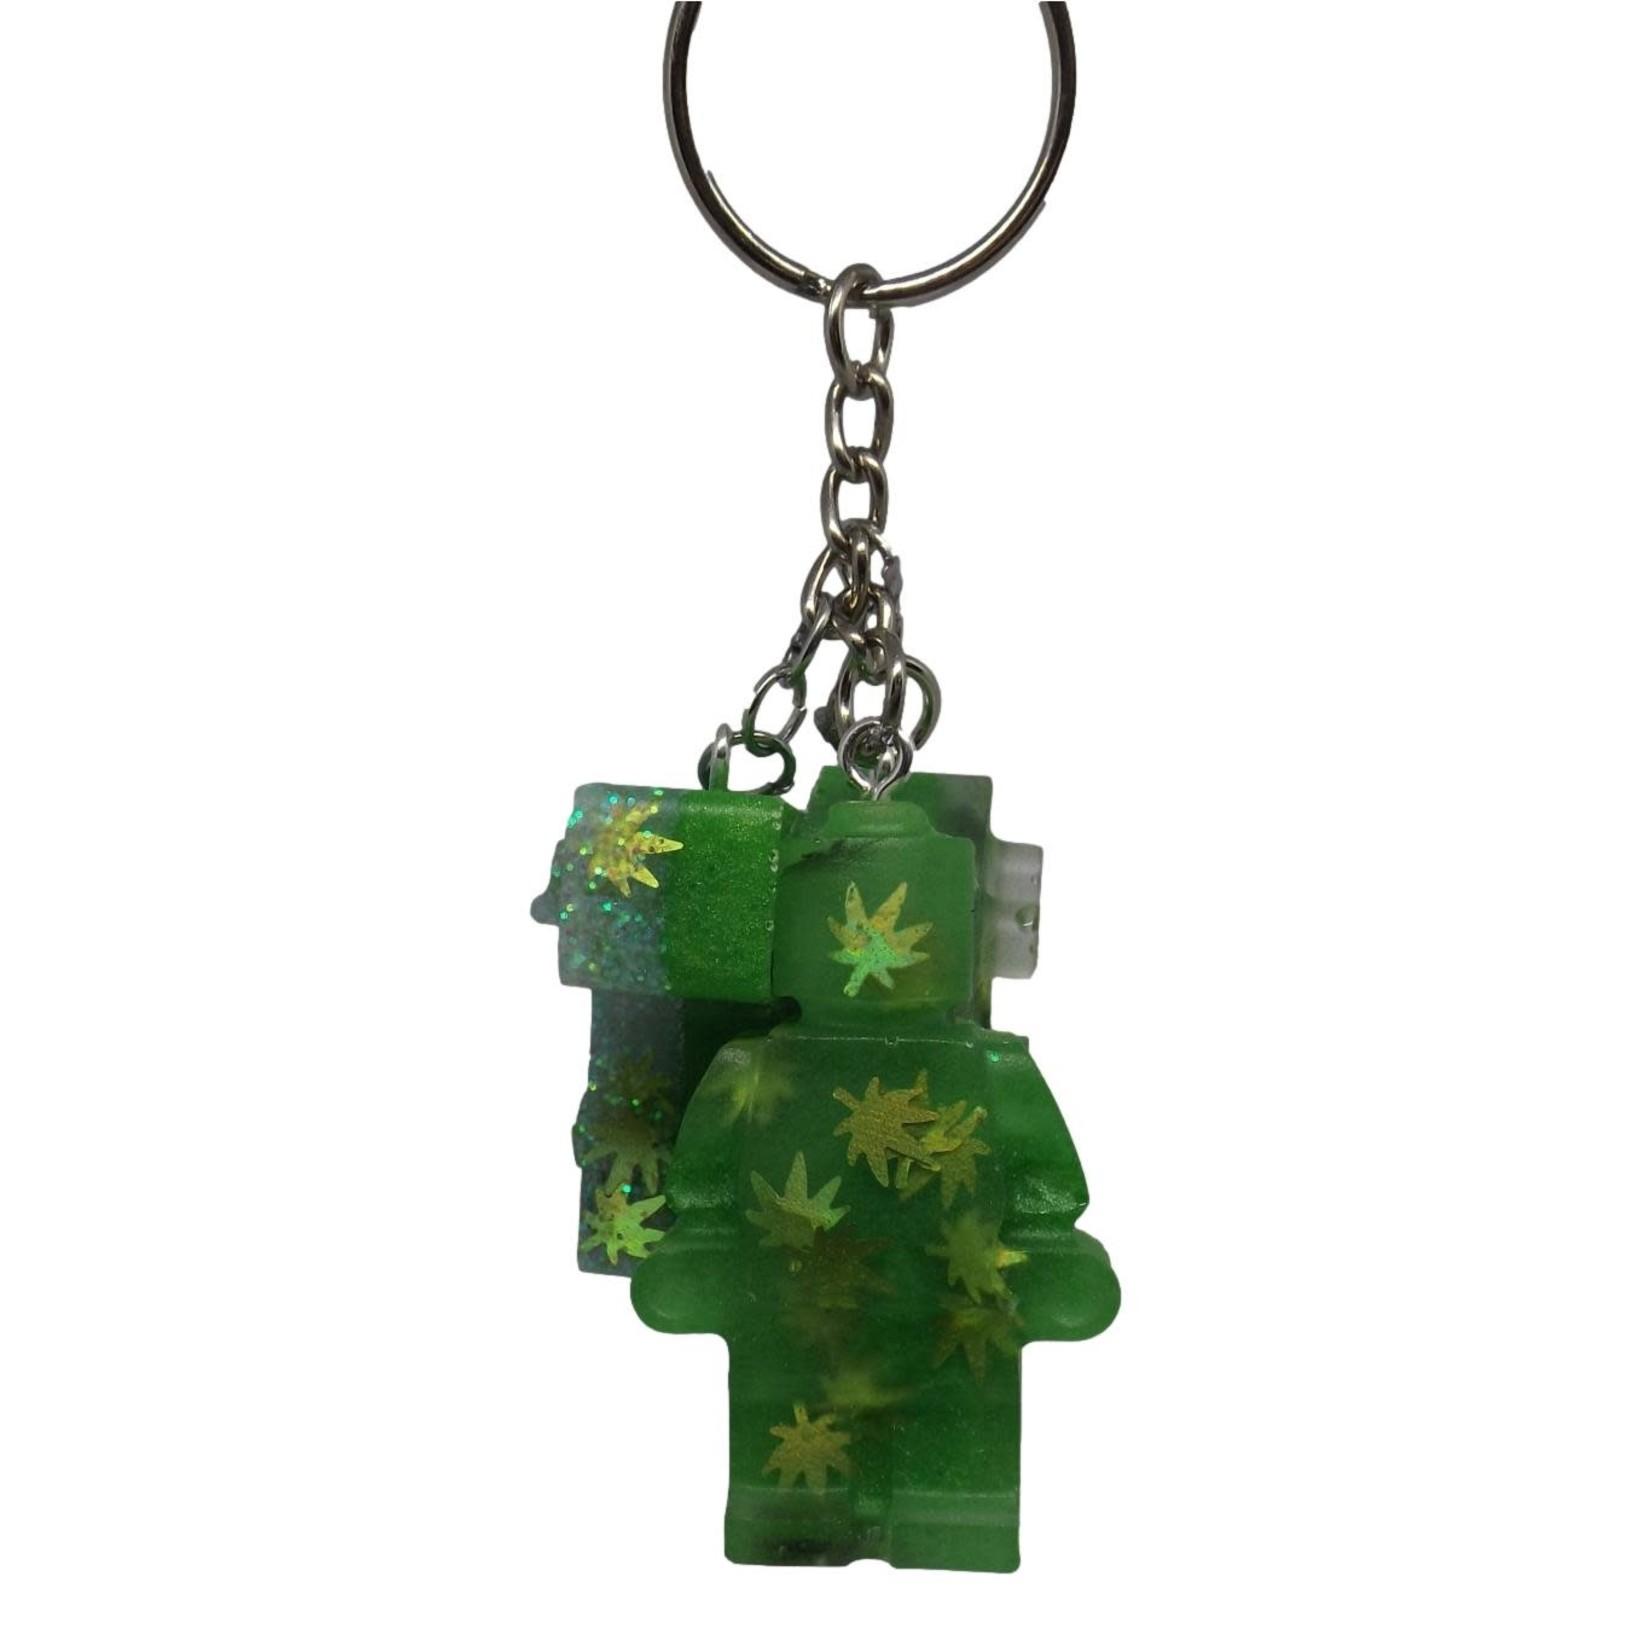 East Coast Sirens Pot Lego Man & Blocks Key Chain